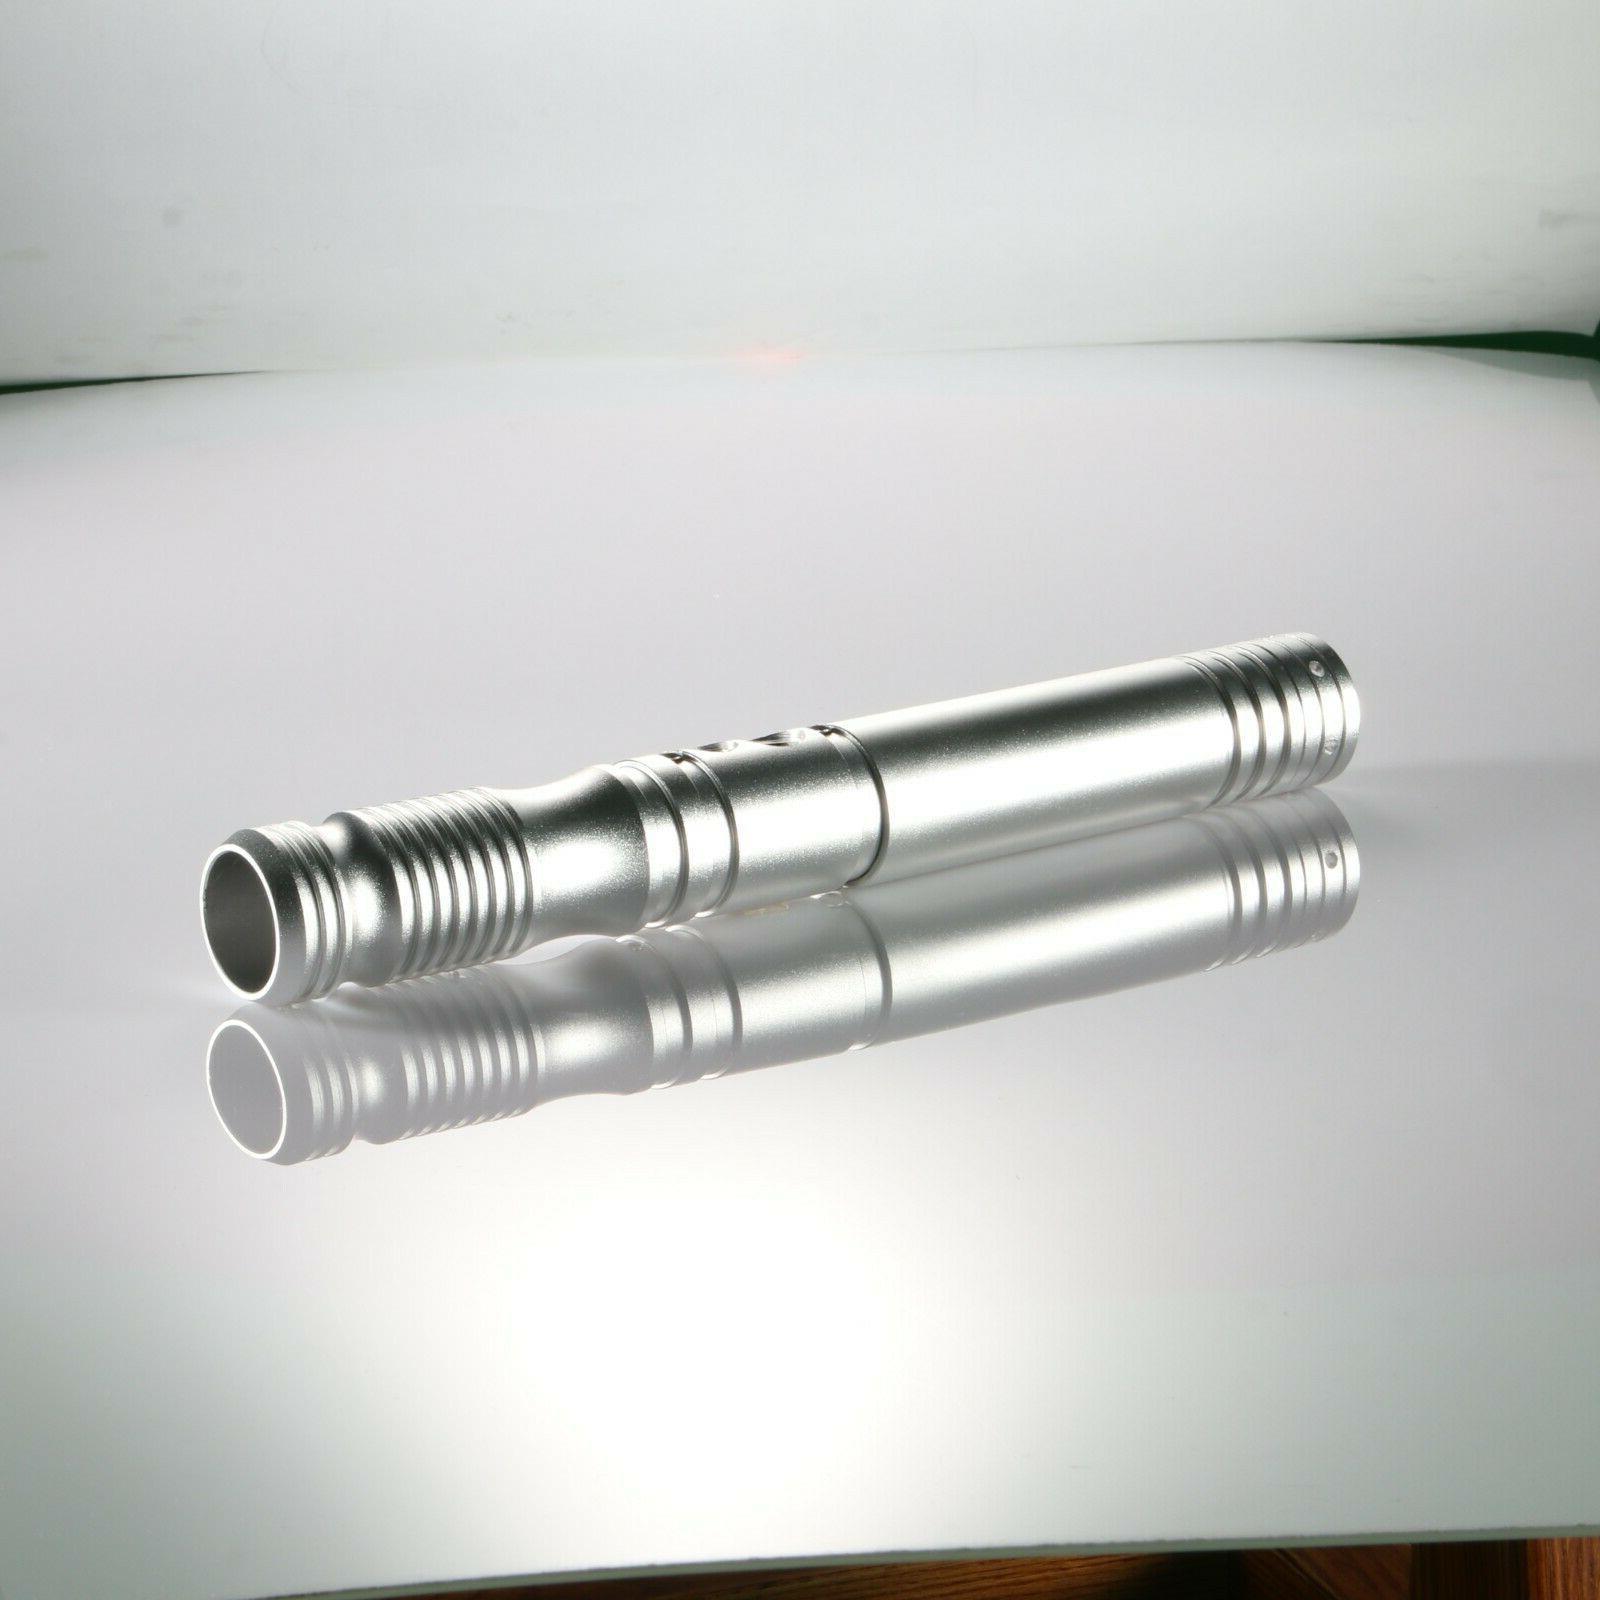 Lightsaber RGB FX Heavy Dueling Color Metal Handle Light